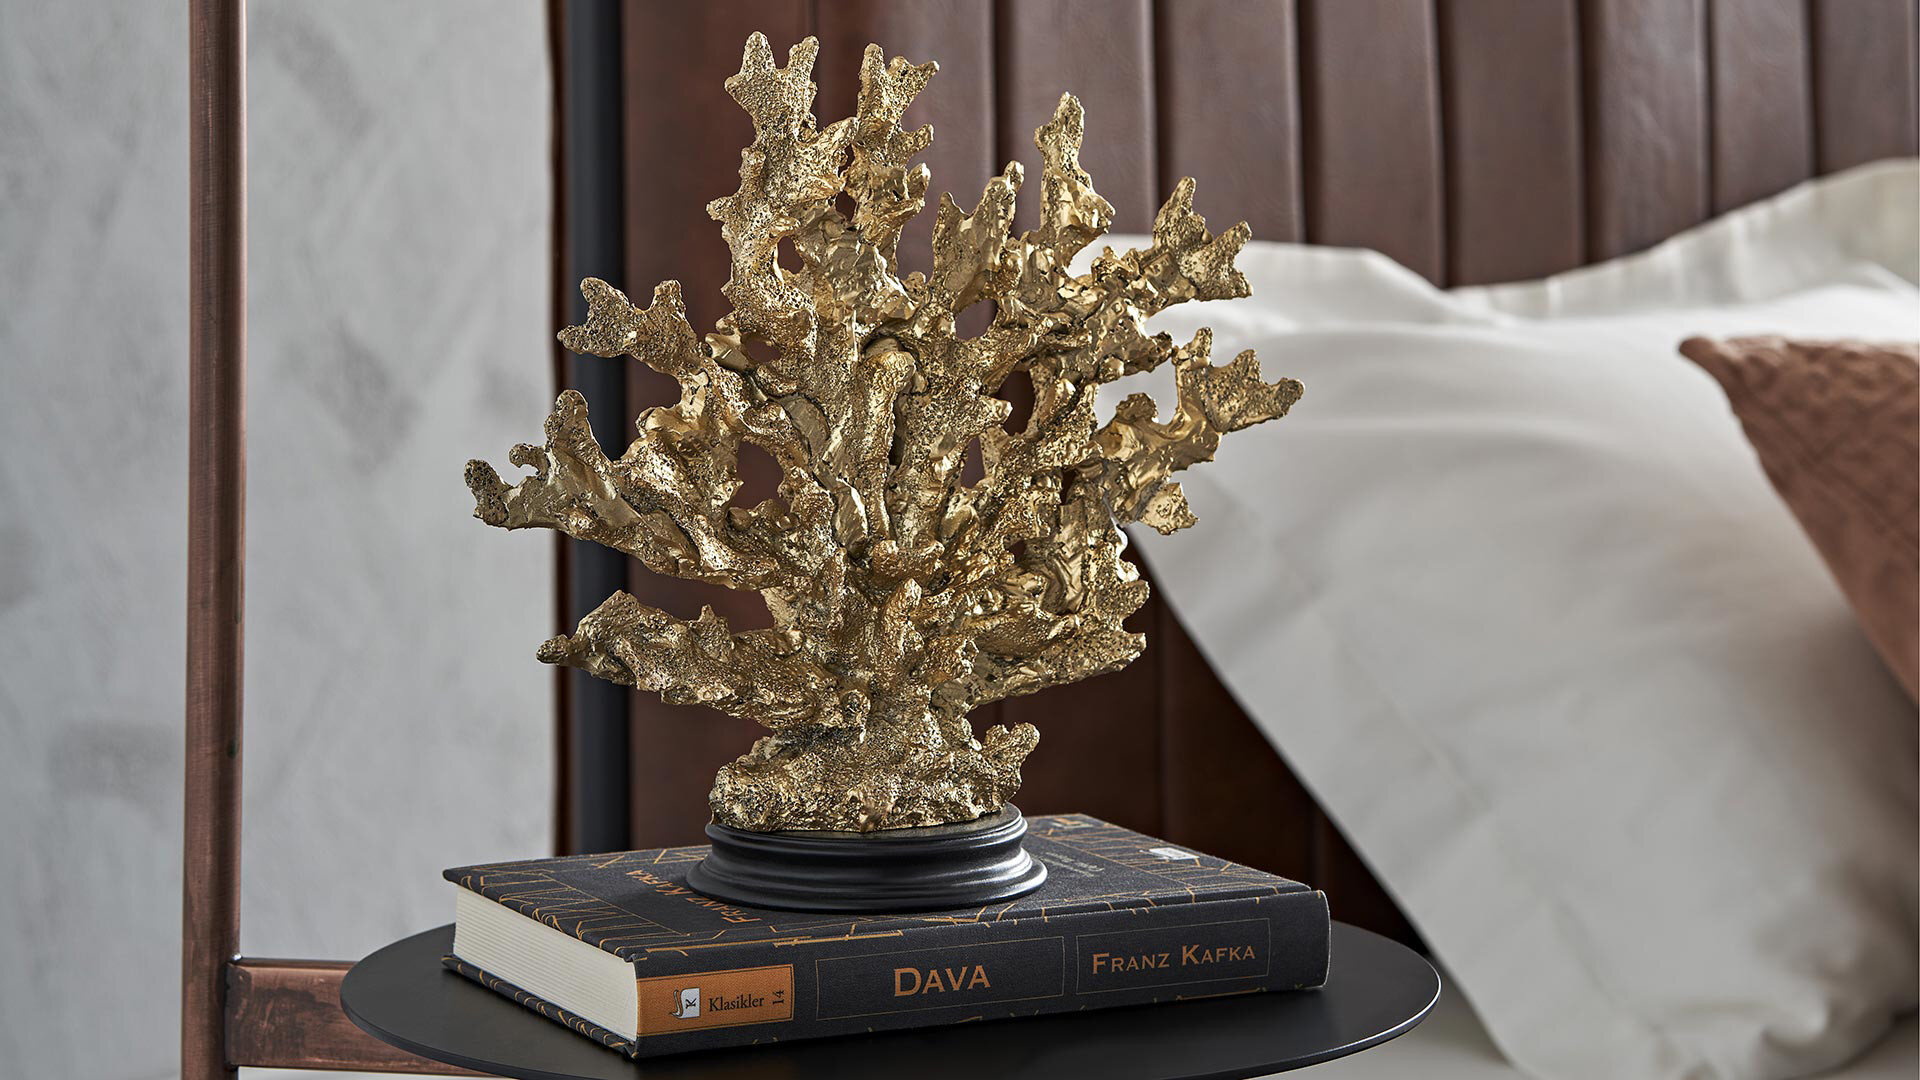 Matılda Gold Mercan